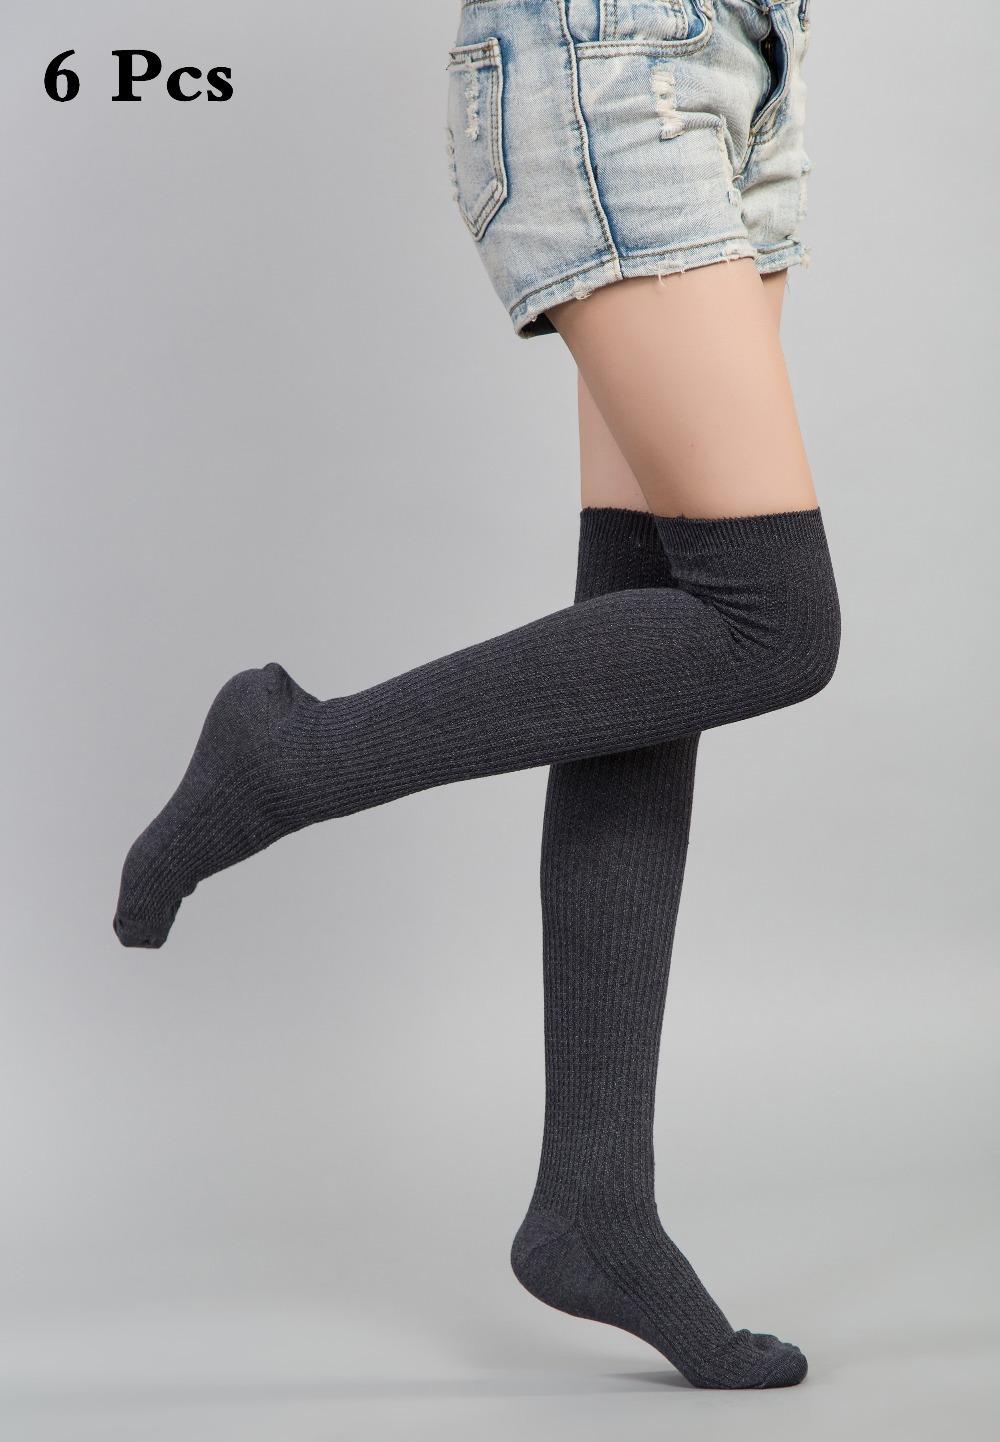 Knee High Socks Sex 70